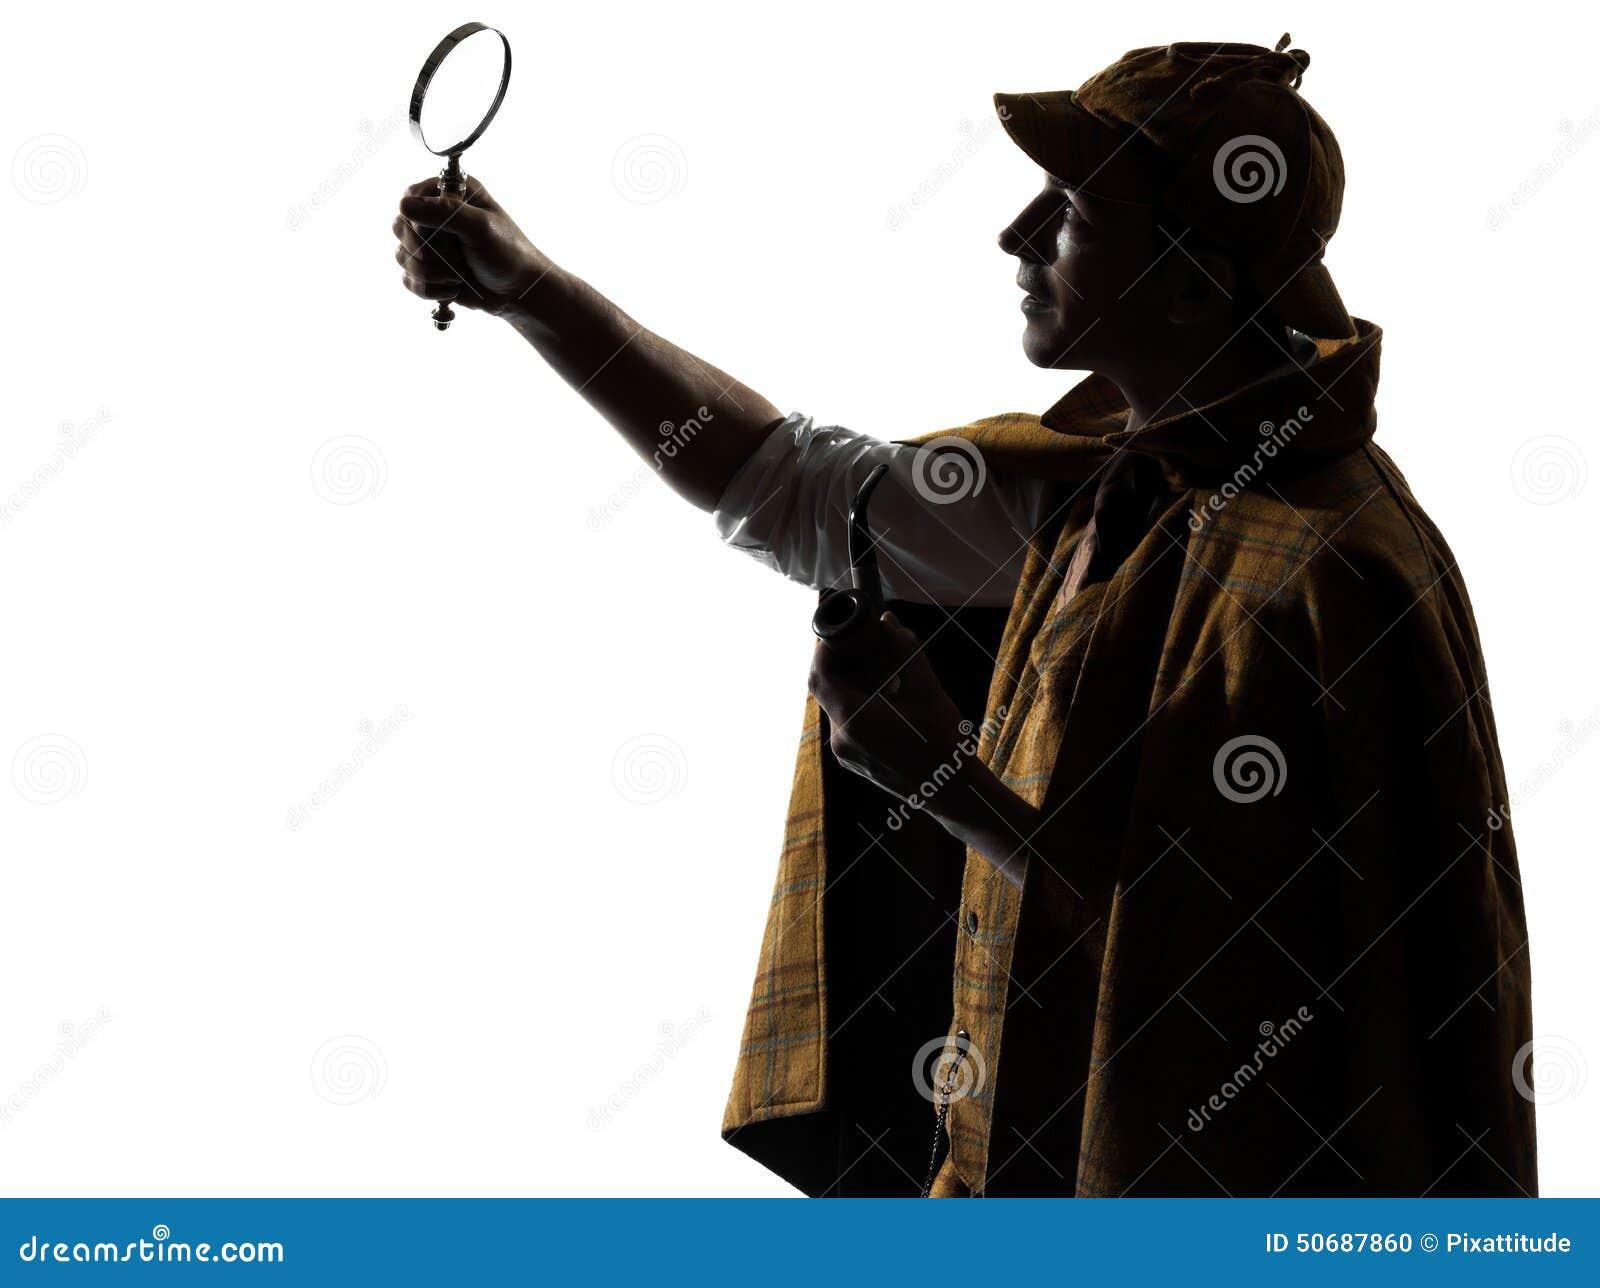 Download Sherlock holmes剪影 库存照片. 图片 包括有 holmes, 扩大化, 法律, 纵向, 剪影 - 50687860